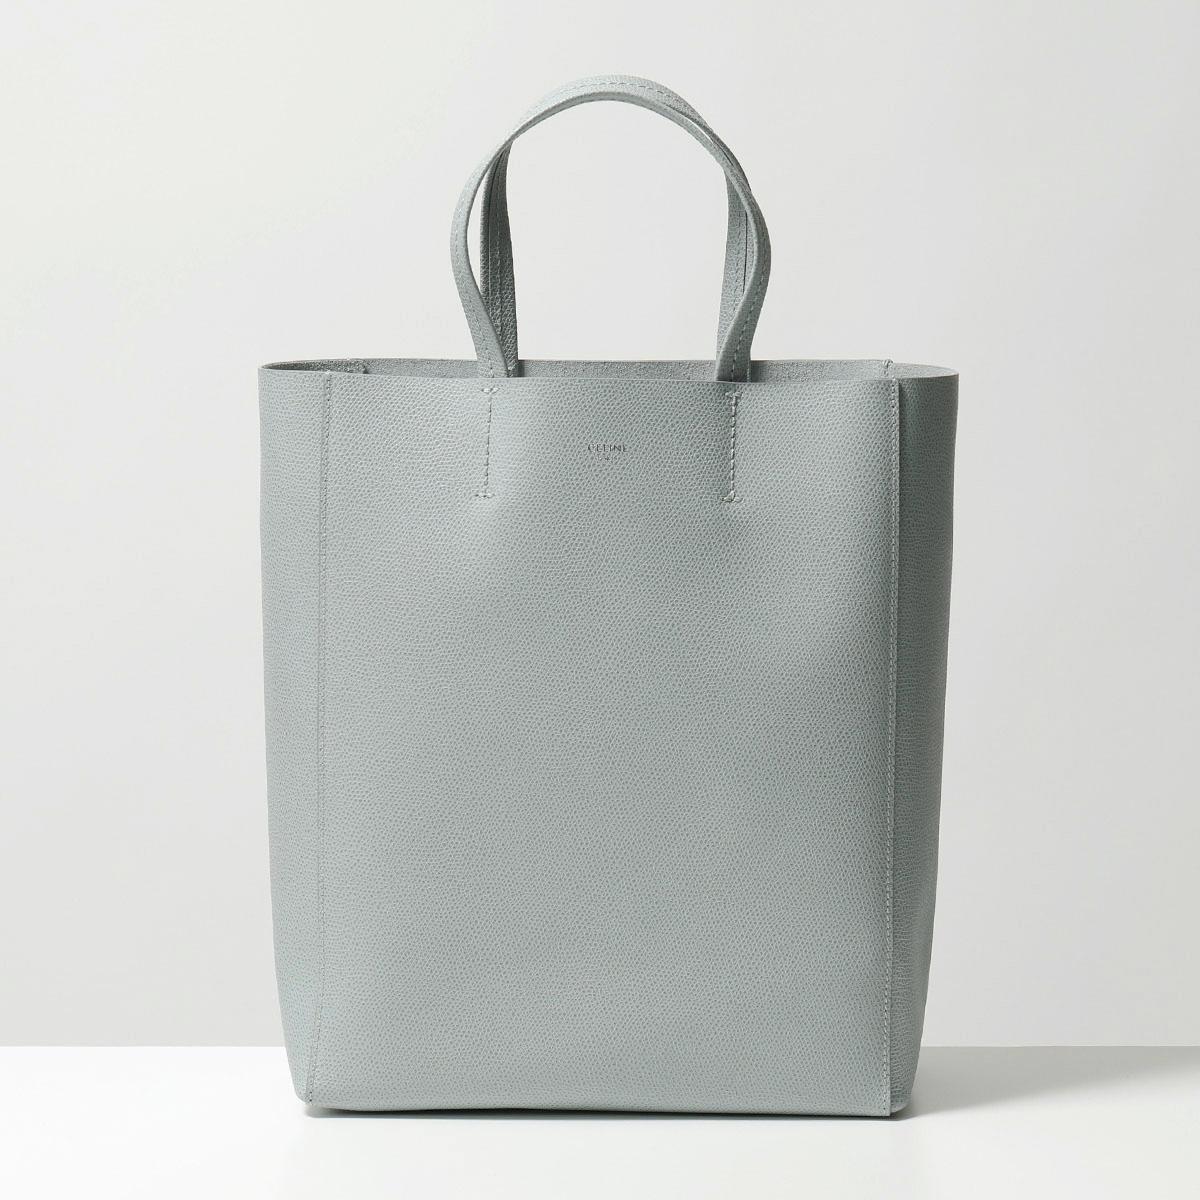 CELINE セリーヌ 189813XBA.07ME/Mineral Small Vertical バーティカル レザー トートバッグ ショルダーバッグ 鞄 レディース